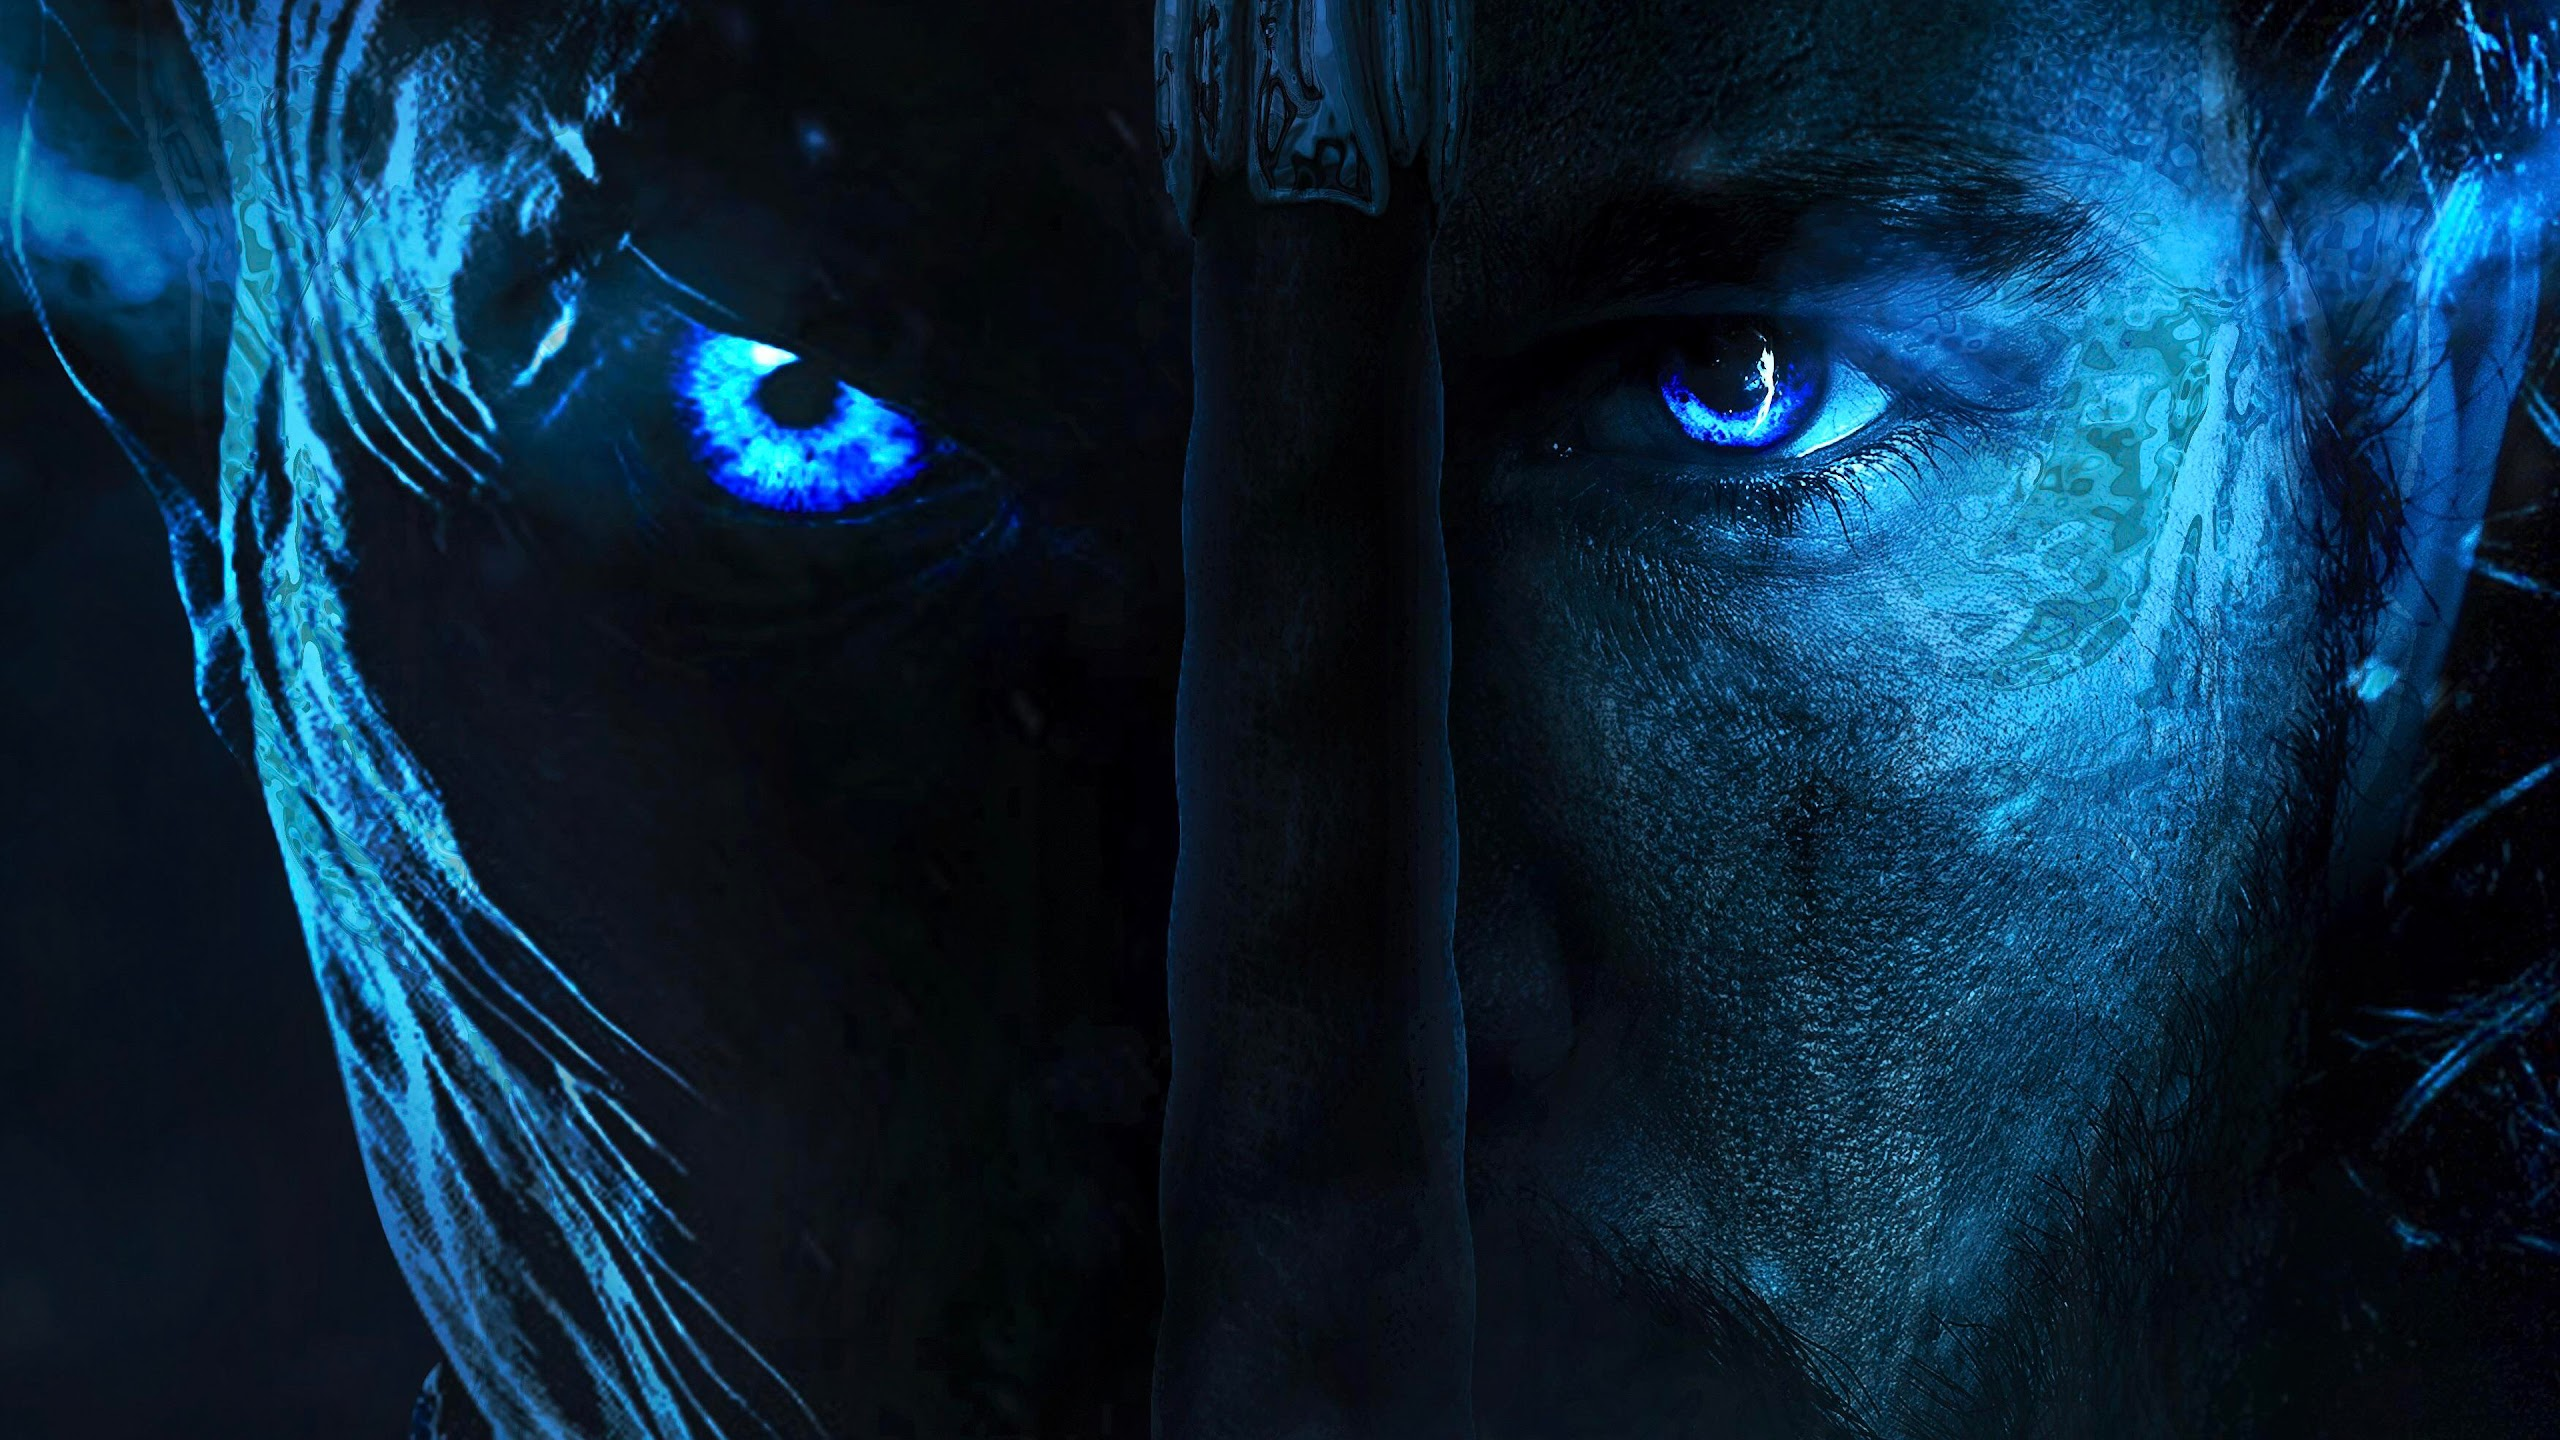 Night King And Jon Snow Game Of Thrones Season 8 4k Wallpaper 38